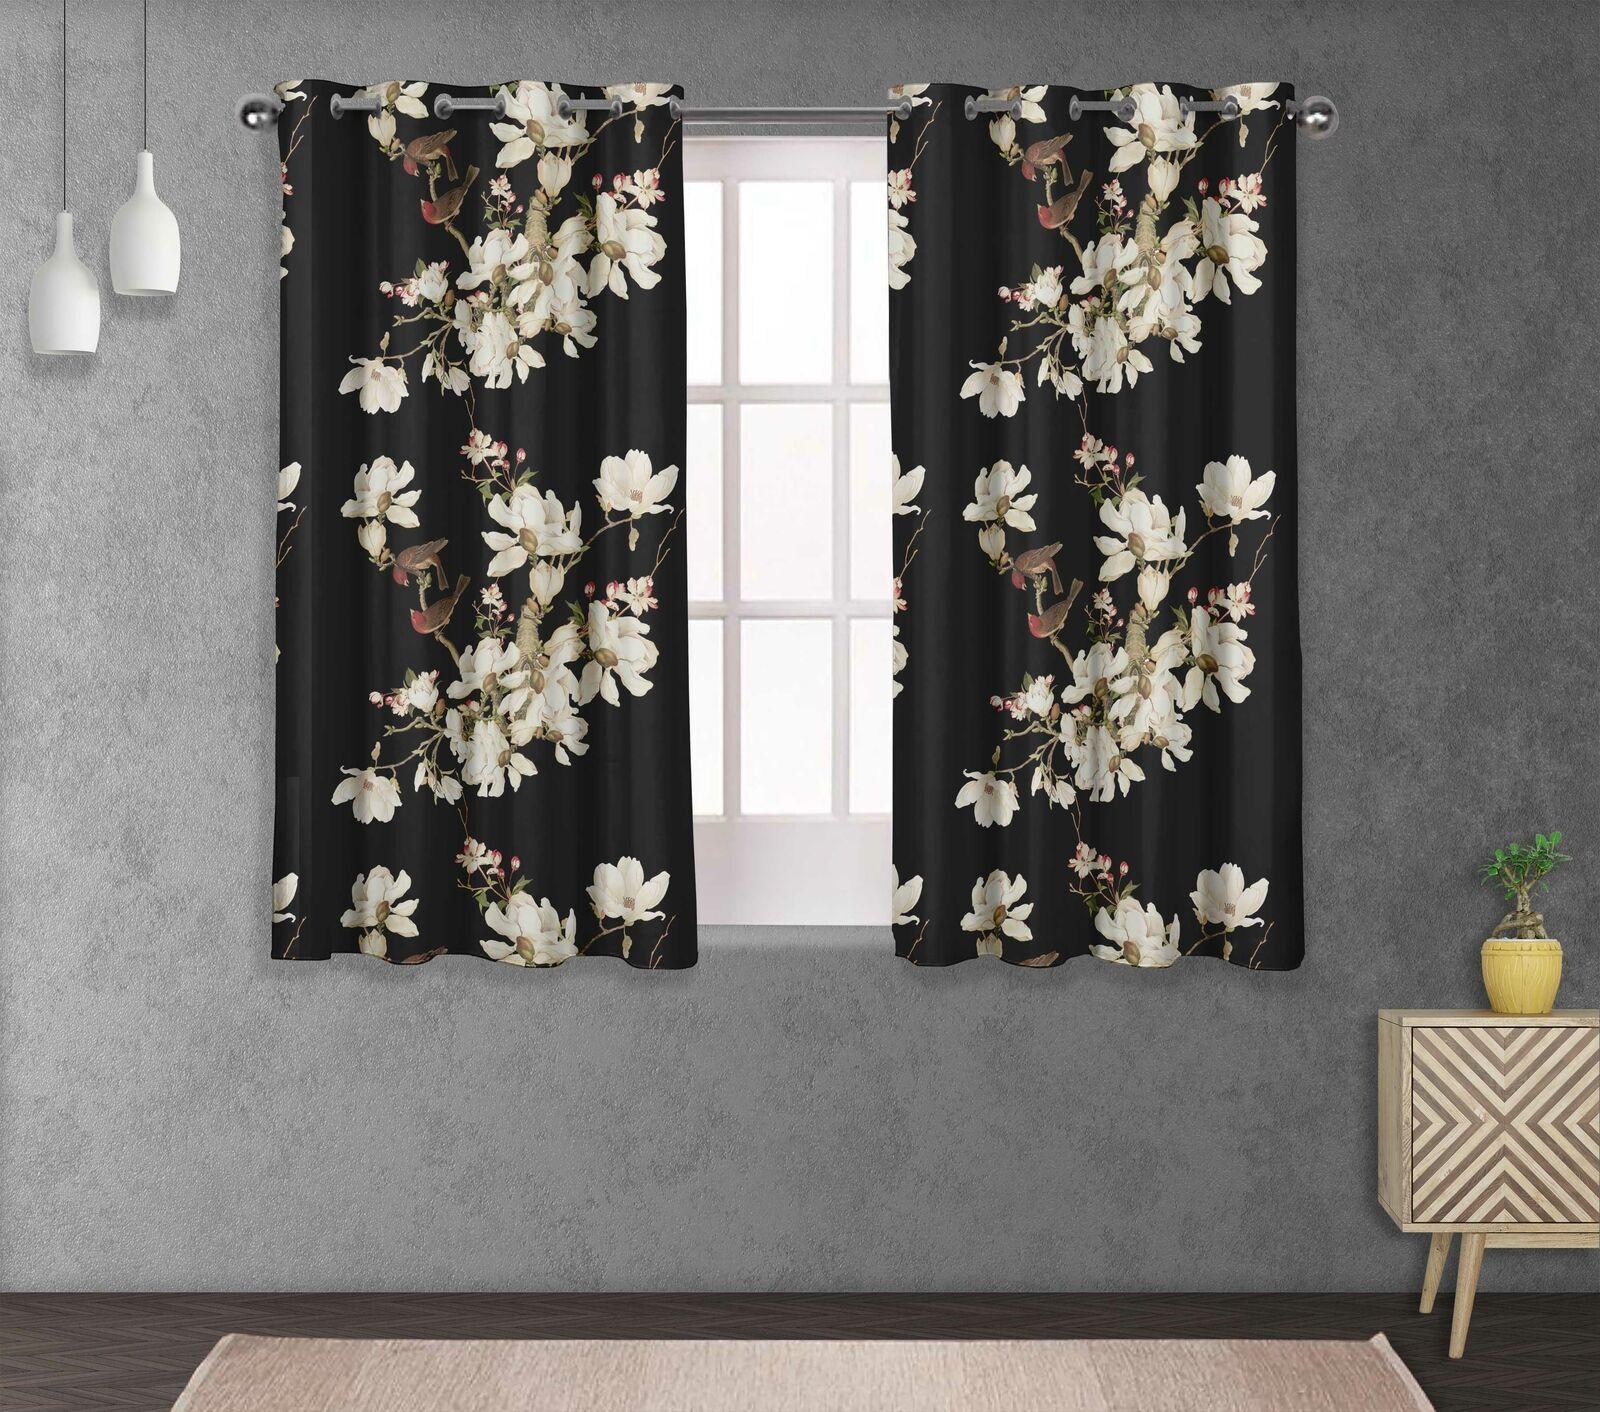 S4sassy Bird & Magnolia Home Decor short & long Curtain Eyelet Panel-FL-121E